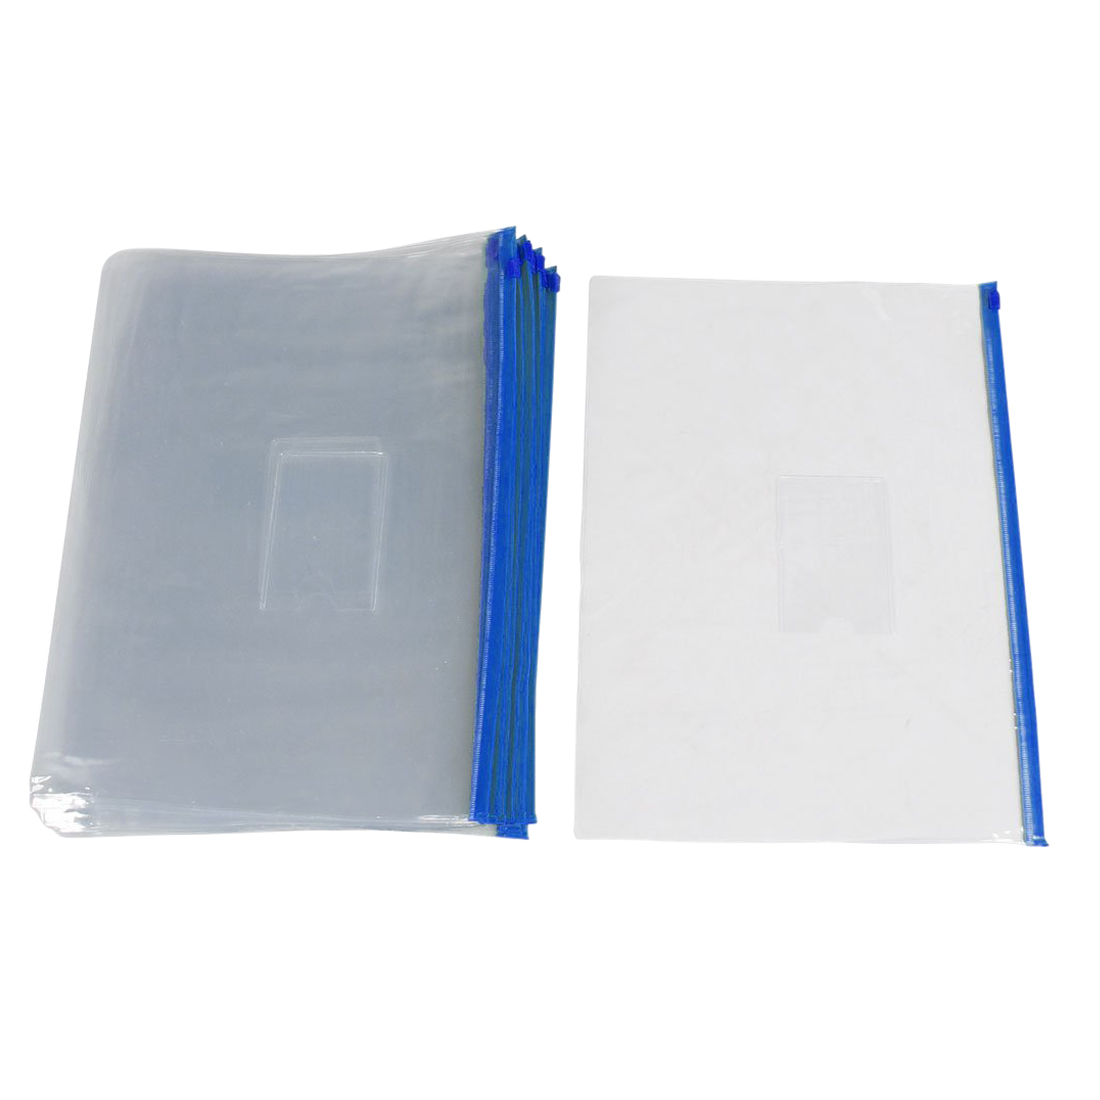 Affordable 20 Pieces Transparent Blue Plastic Bag With A Zipper Slide Holder A4 Paper Bag